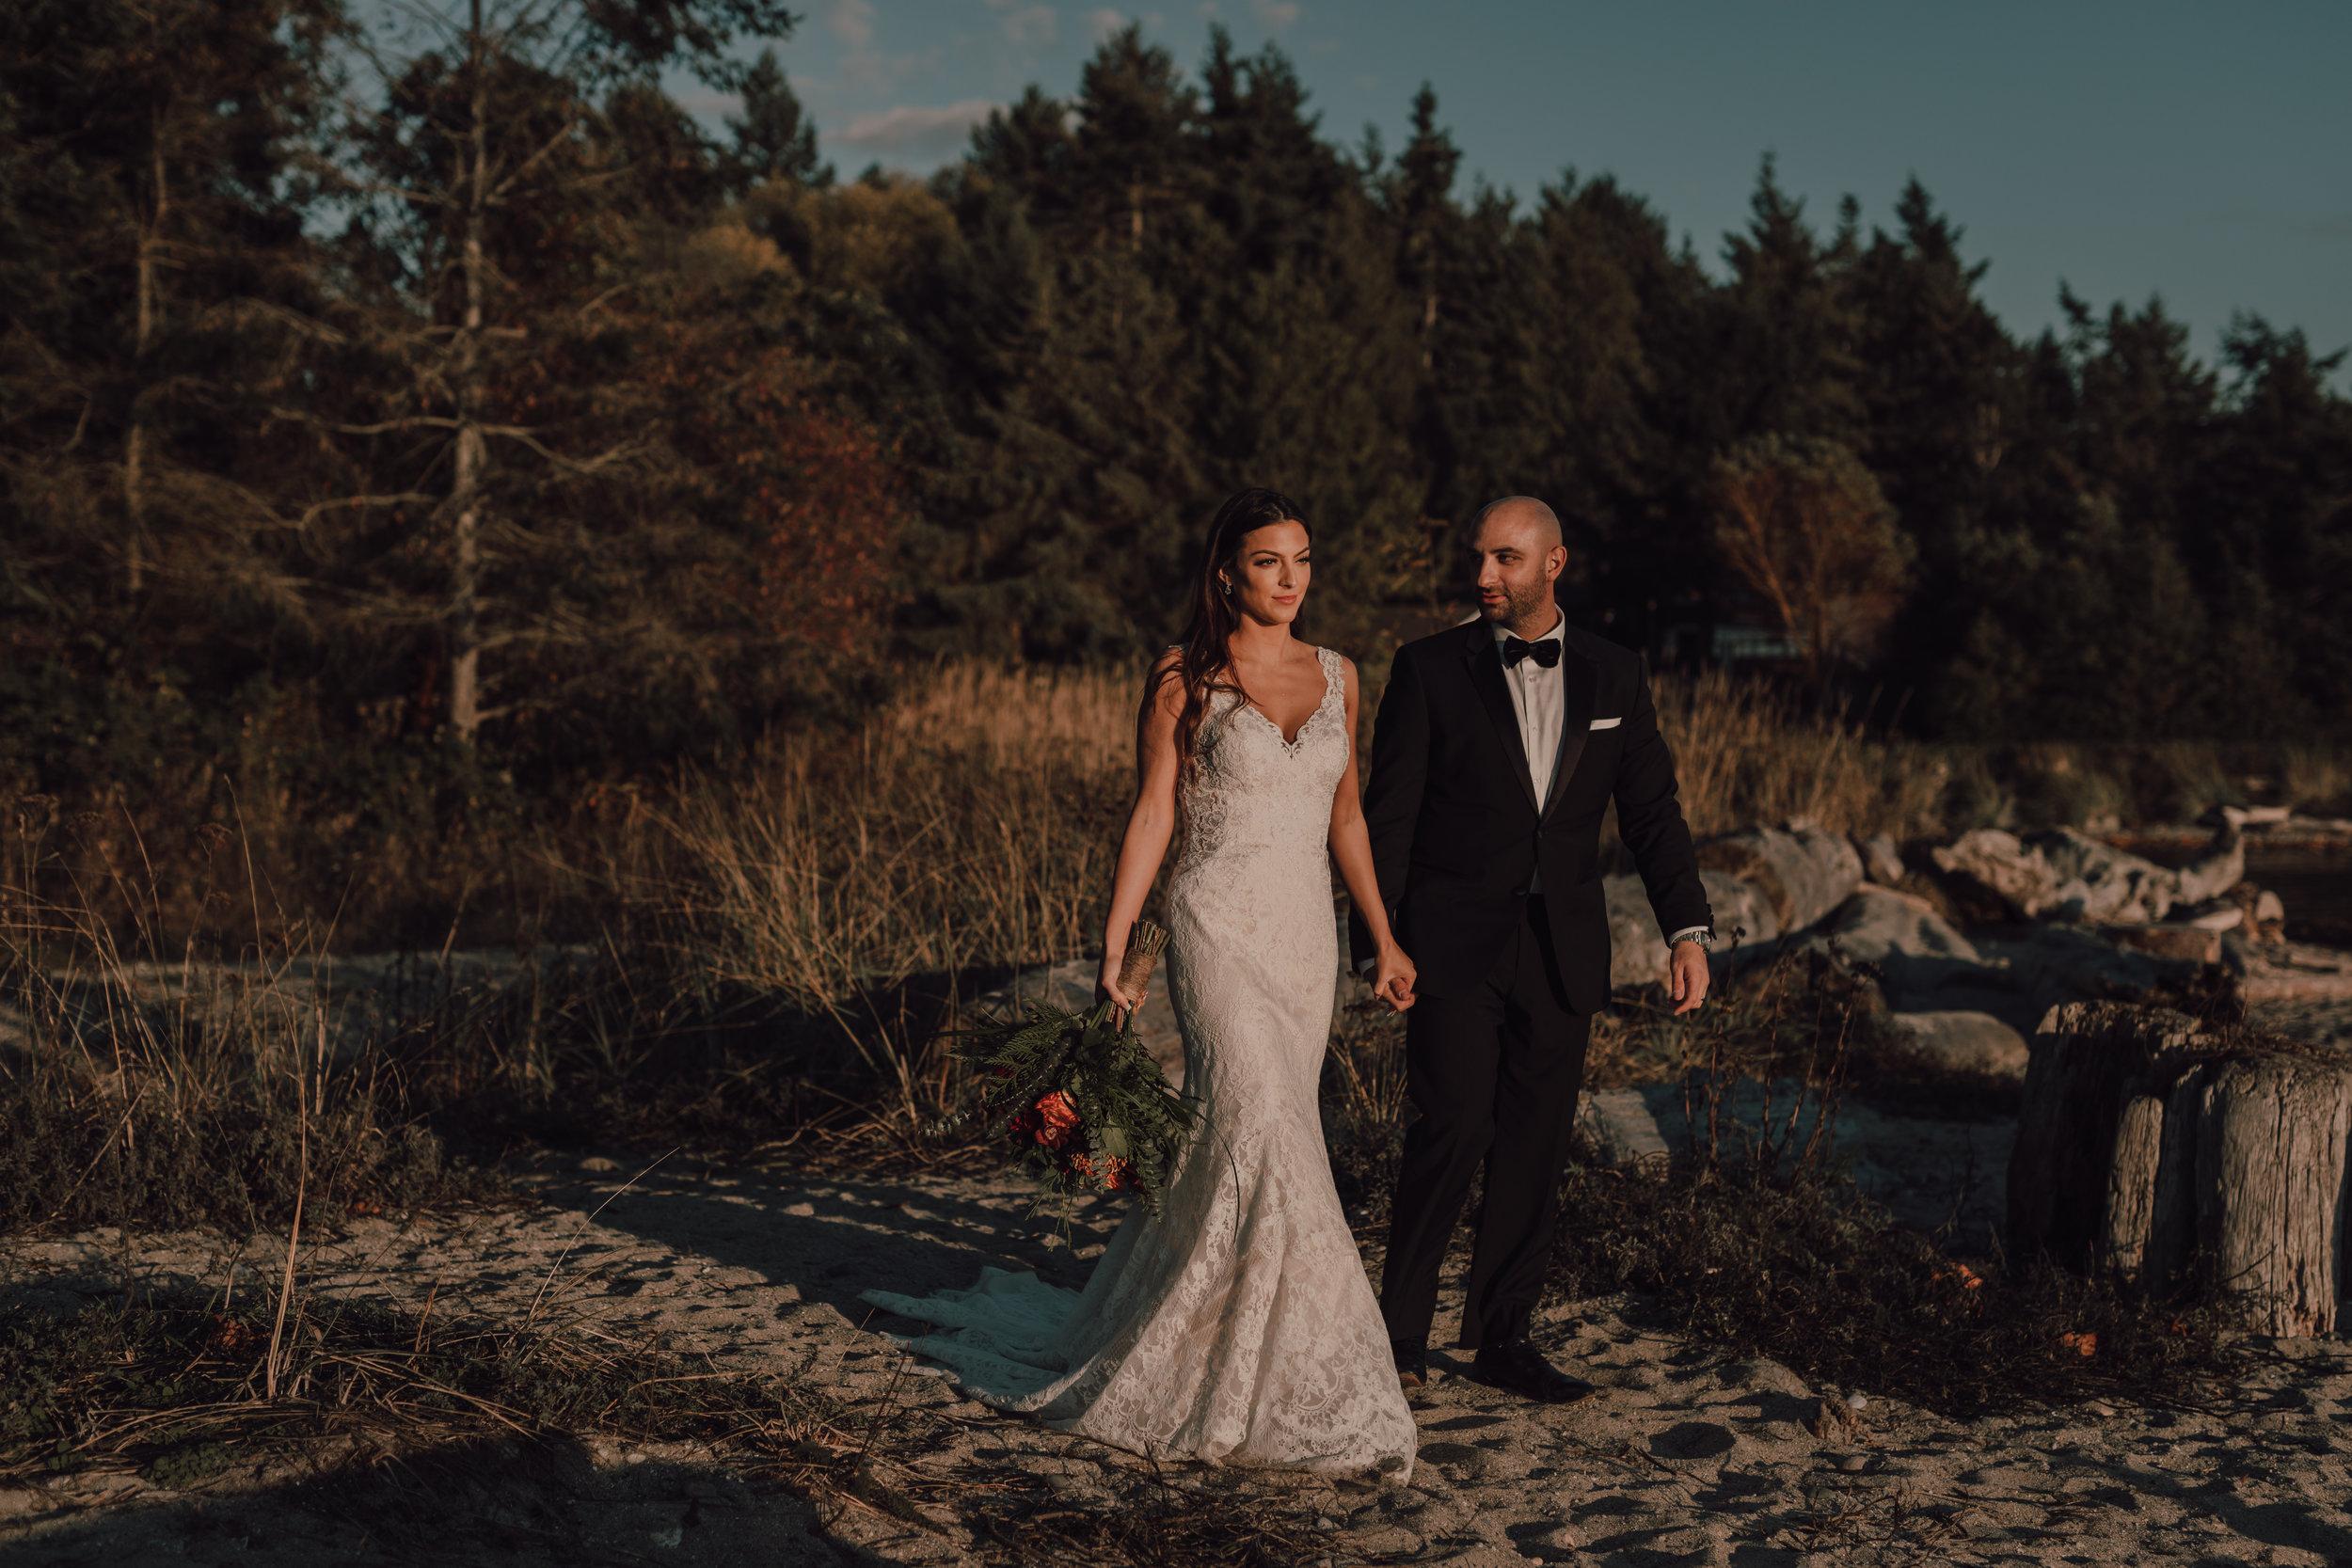 Day After Wedding Photos - Sunshine Coast Wedding Photos - Sunset Wedding Photos - Vancouver Wedding Photographer & Videographer - Sunshine Coast Wedding Photos - Sunshine Coast Wedding Photographer - Jennifer Picard Photography - 1A5A8961.jpg